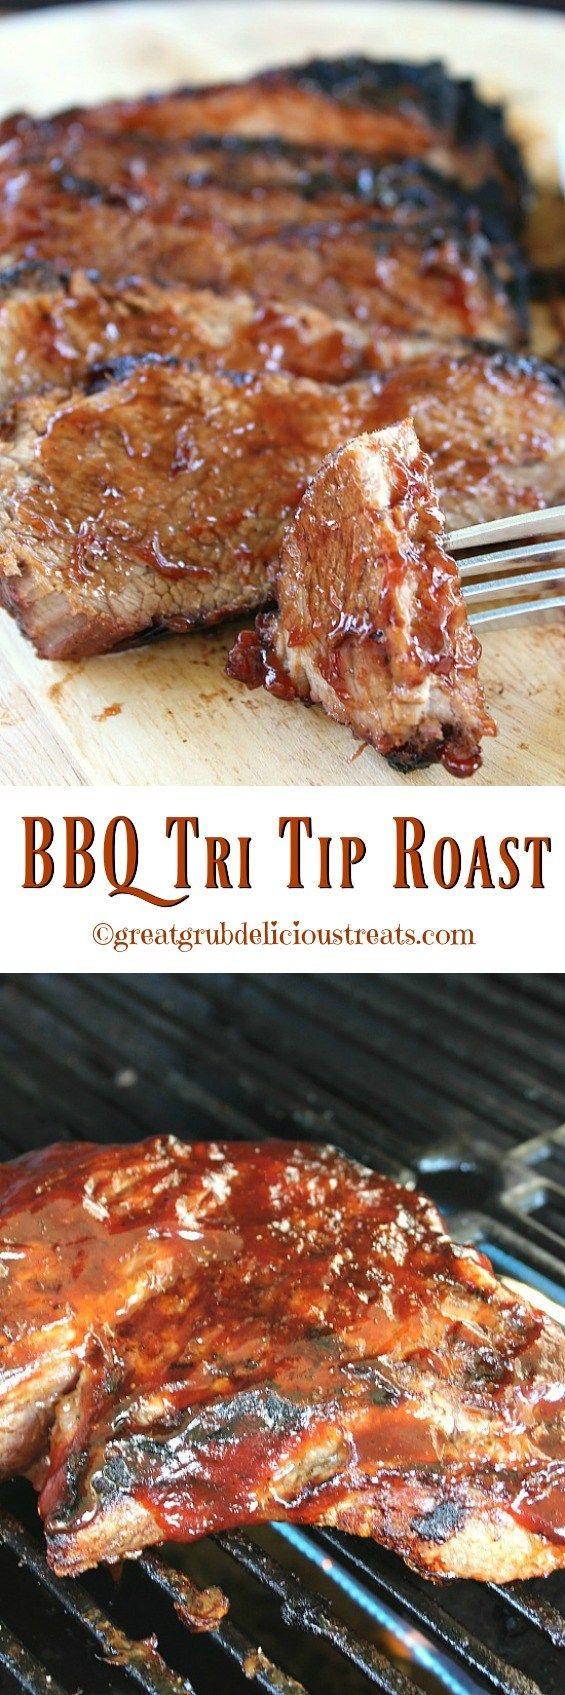 BBQ Tri Tip Roast : greatgrubdelicioustreats